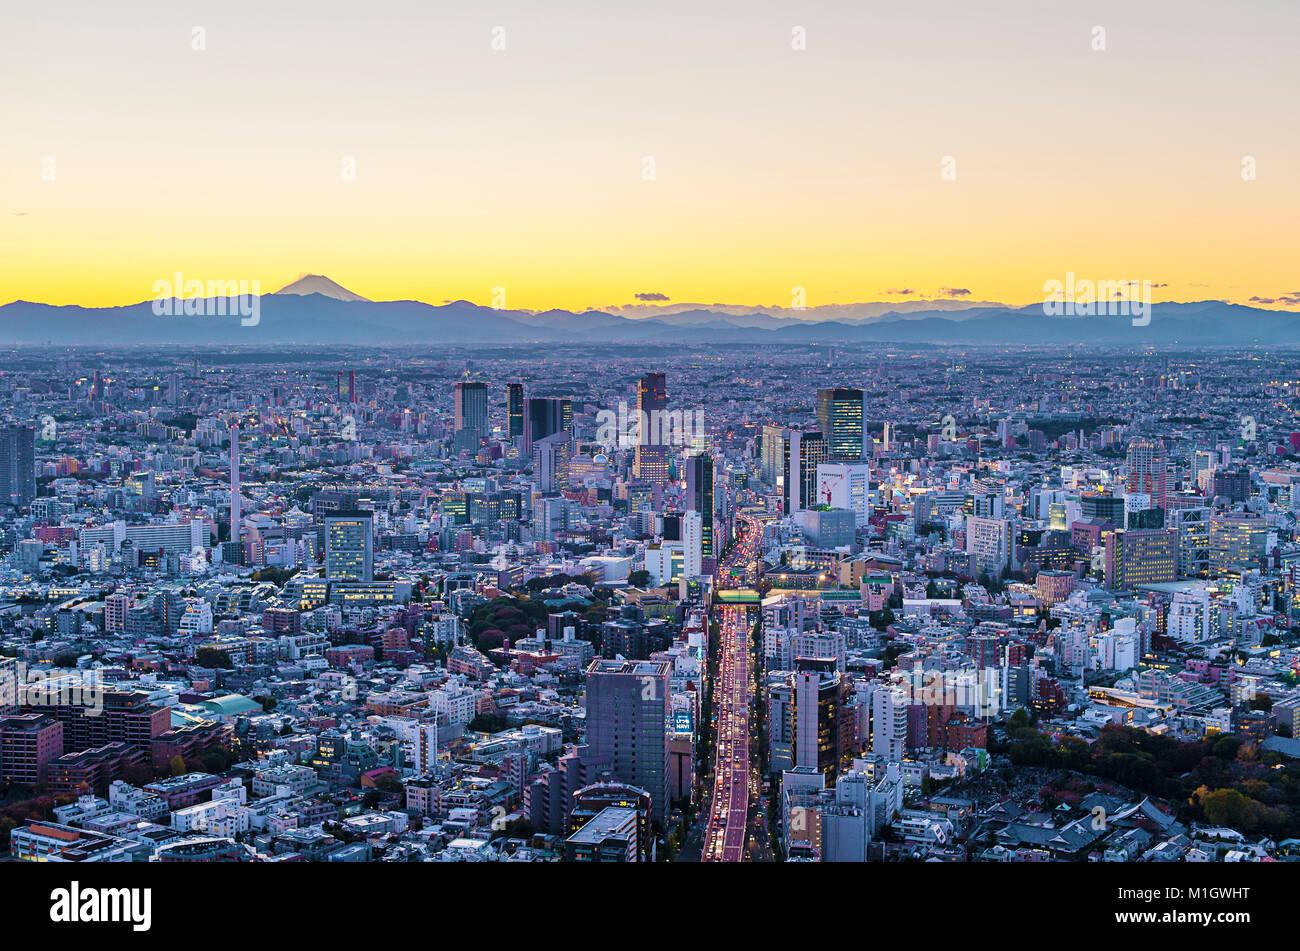 Paisaje Urbano Vista aérea Tokio JAPÓN Imagen De Stock